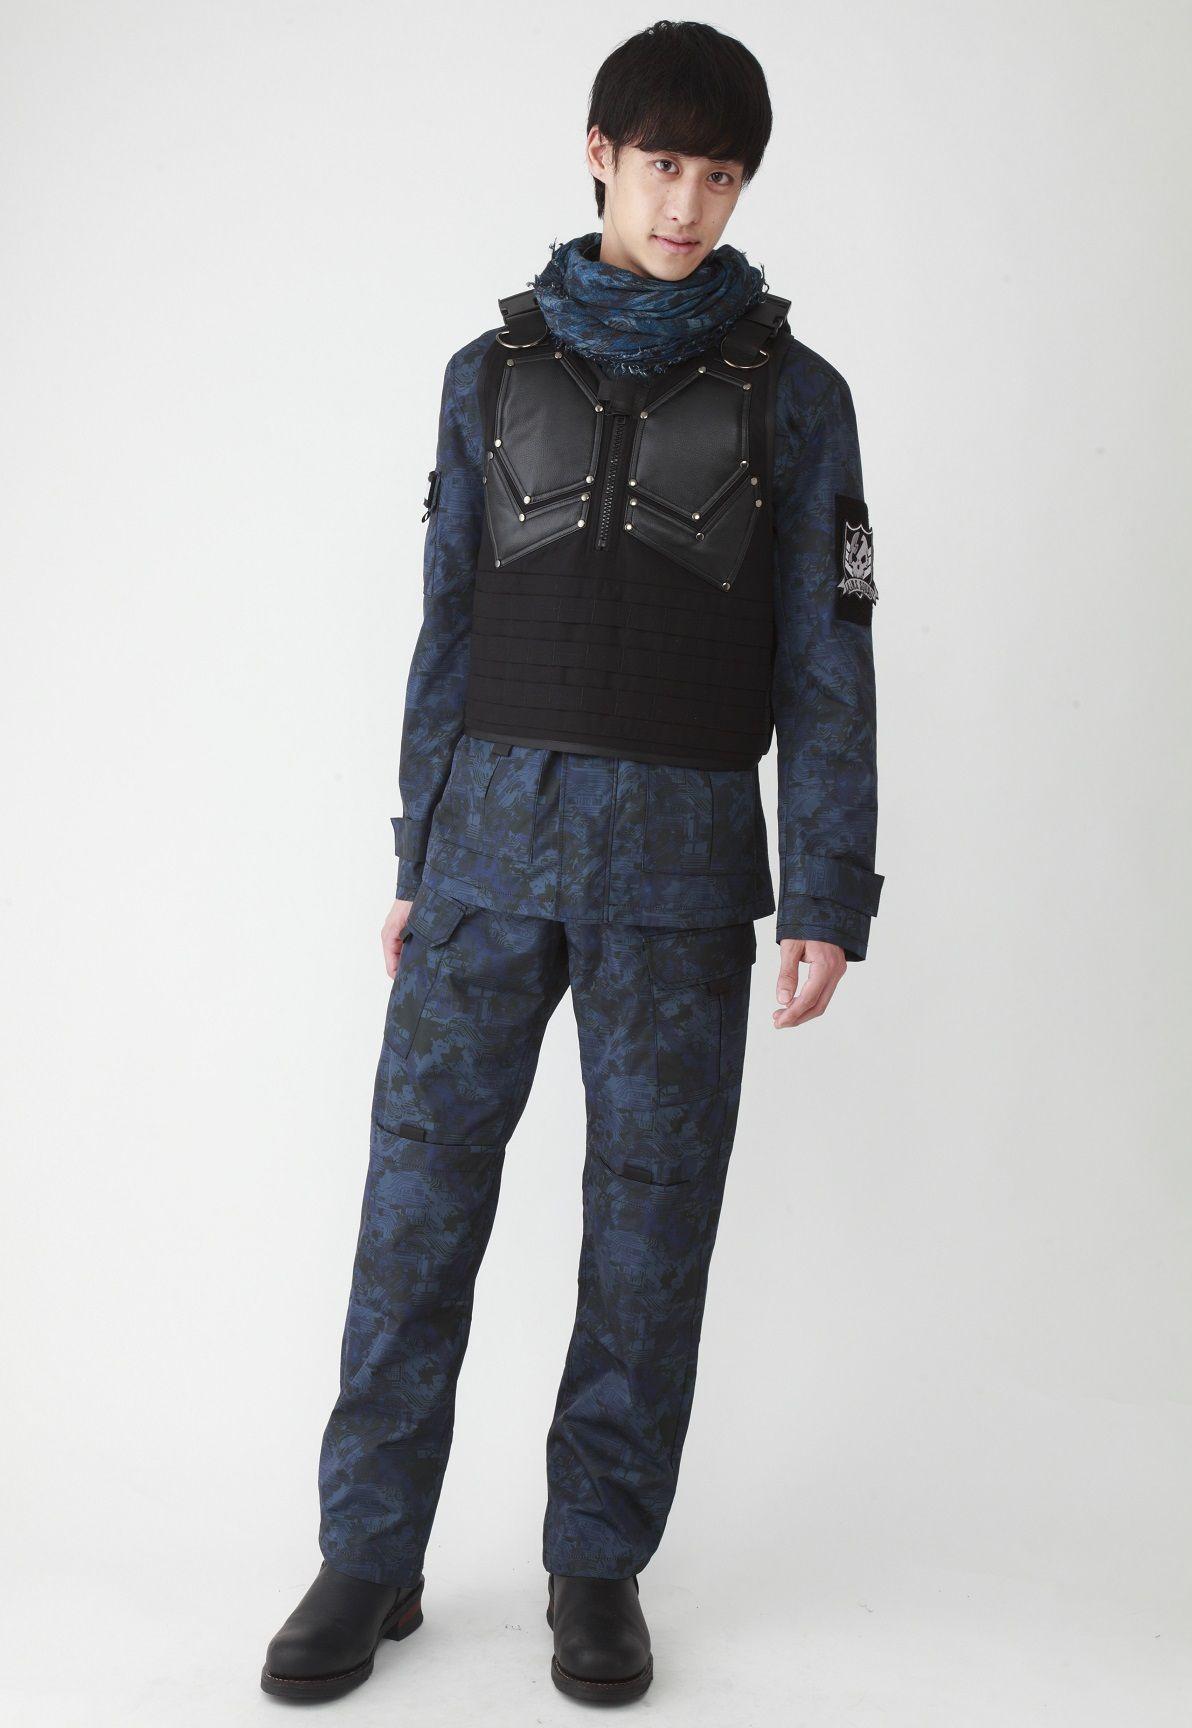 A.I.M.S. SQUAD Pants—Kamen Rider Zero-One